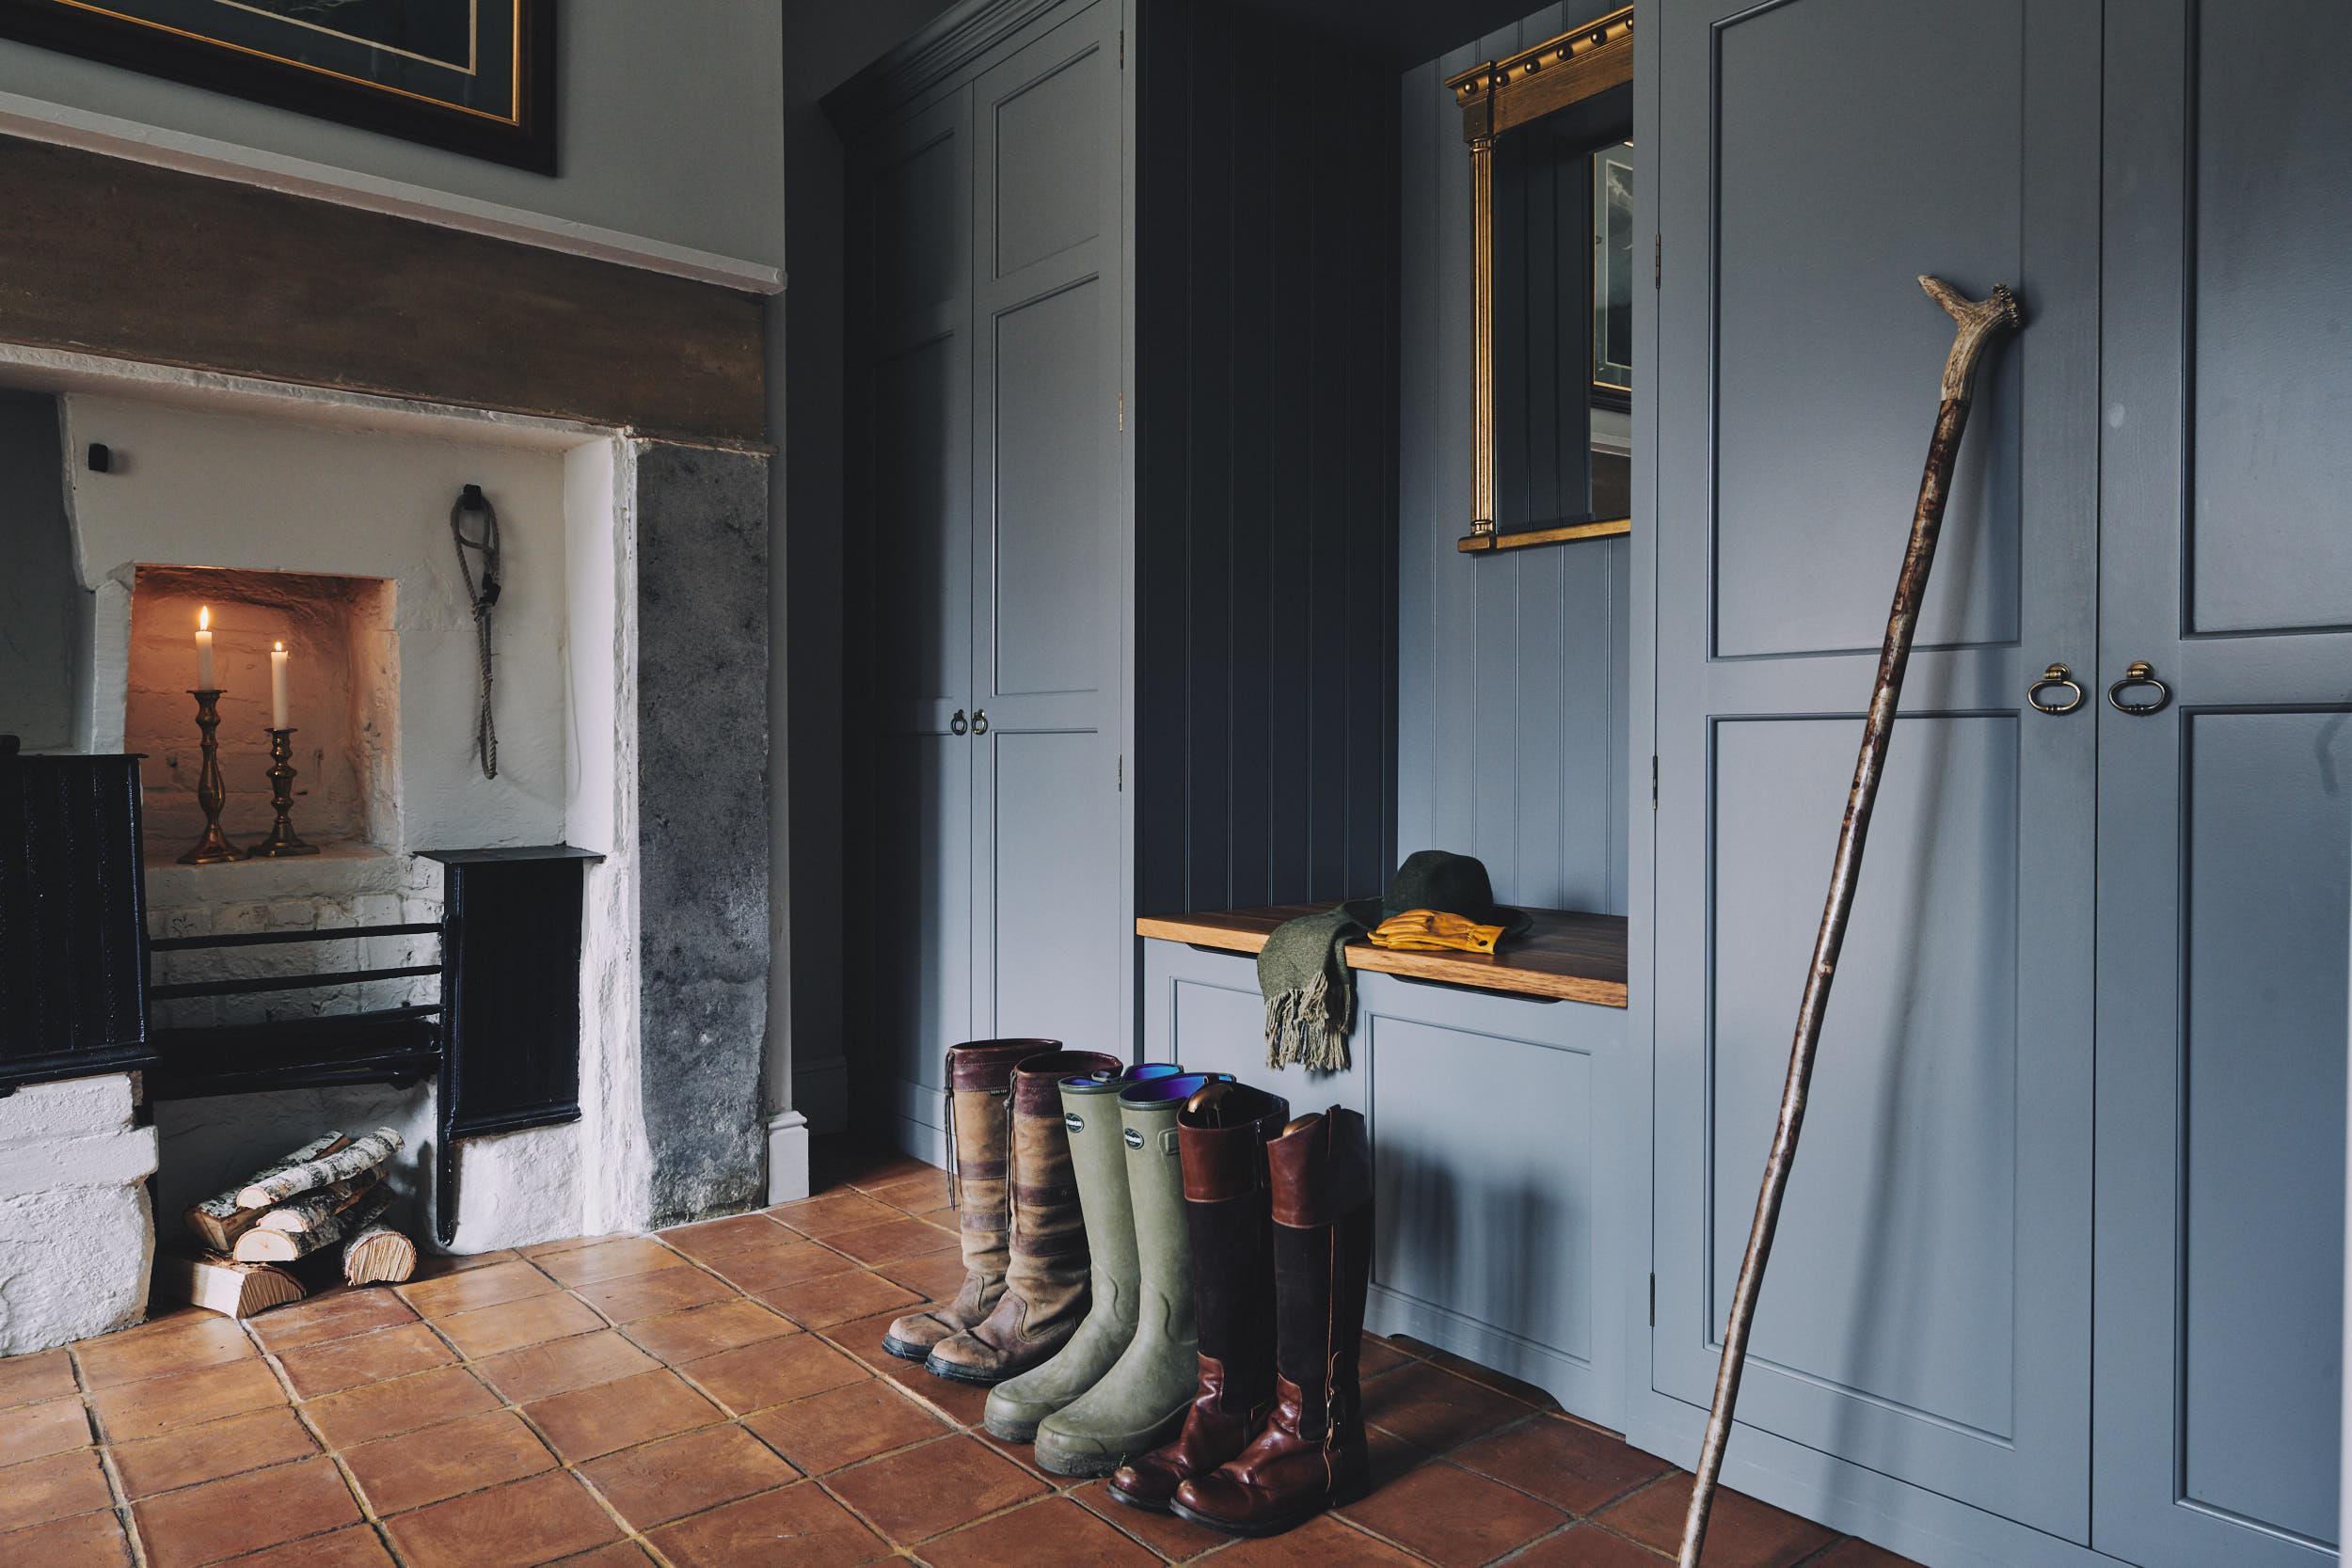 interior photography of luxury bespoke homes by matthew lloyd3163.jpg